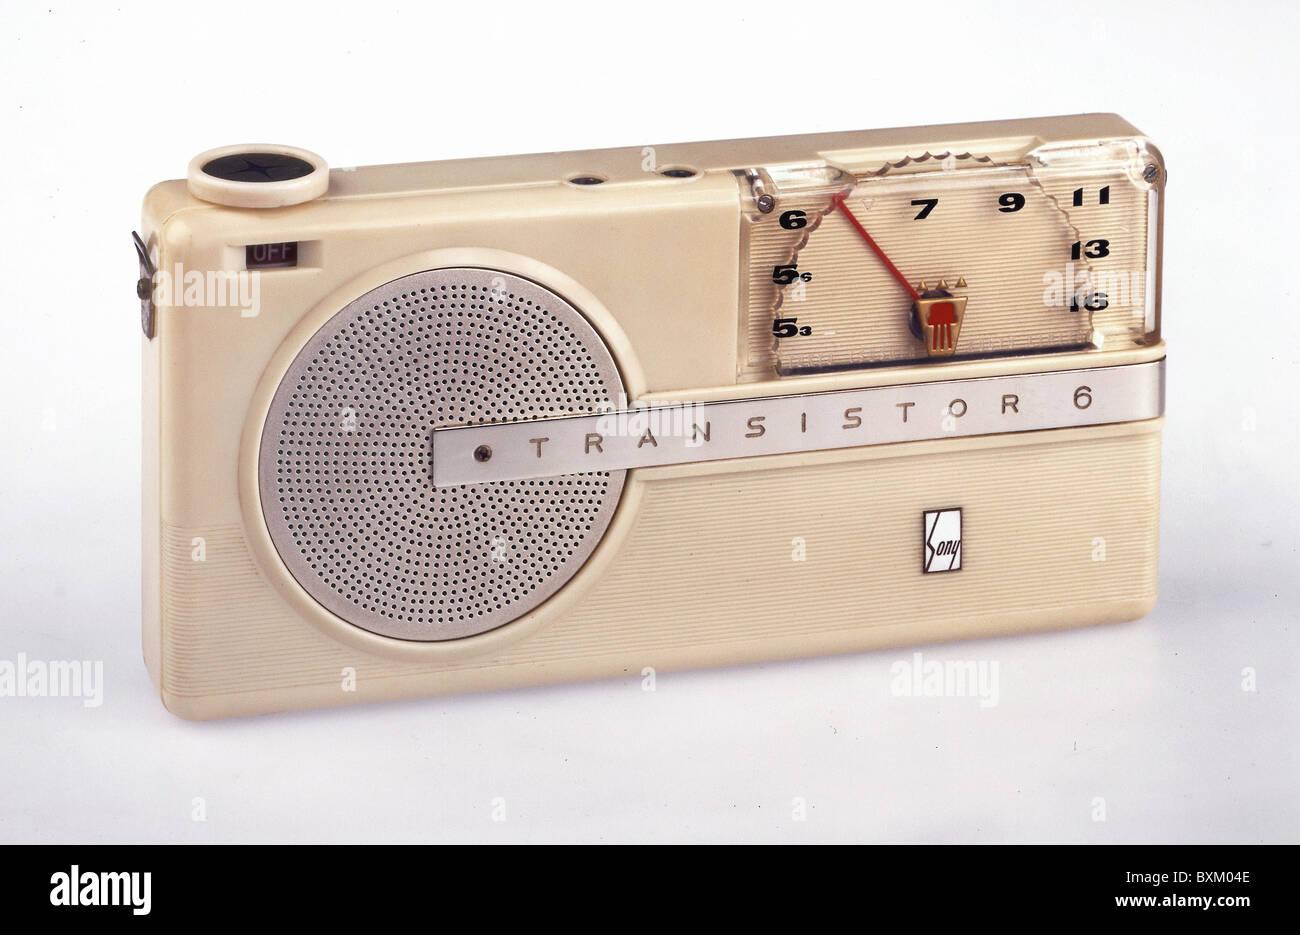 broadcast, radio sets, transistor radio, Sony TR 6, Japan, 1956, communications, technic, technics, historic, historical, - Stock Image